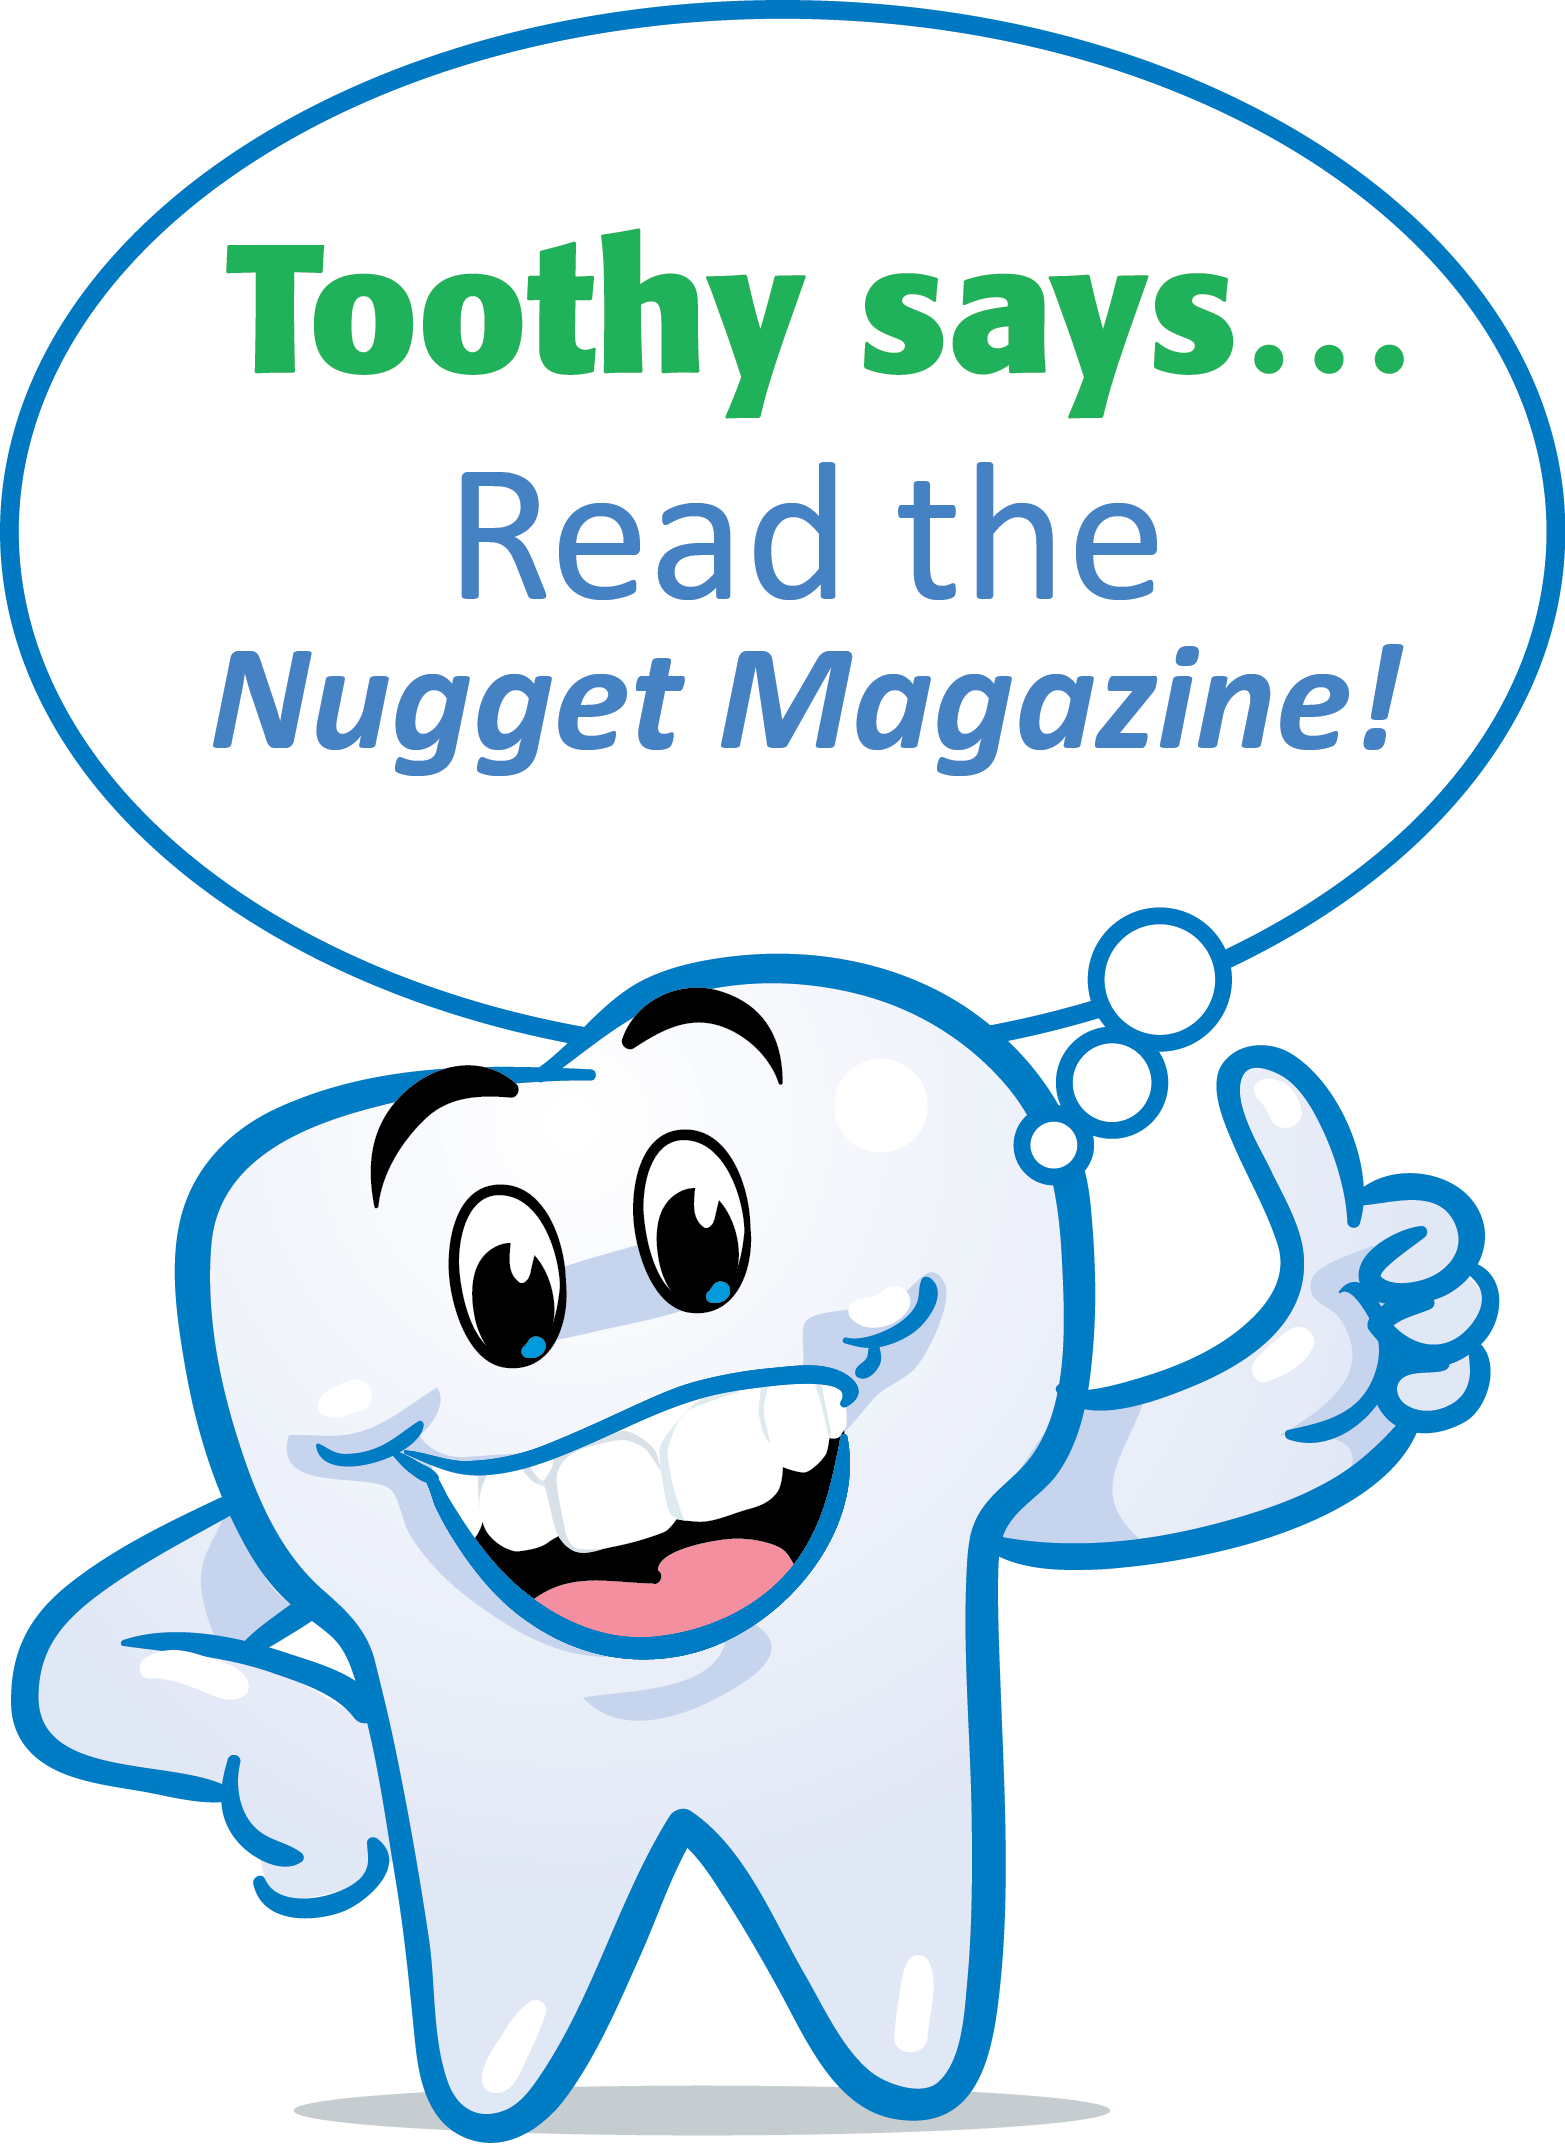 Read the Nugget Magazine!